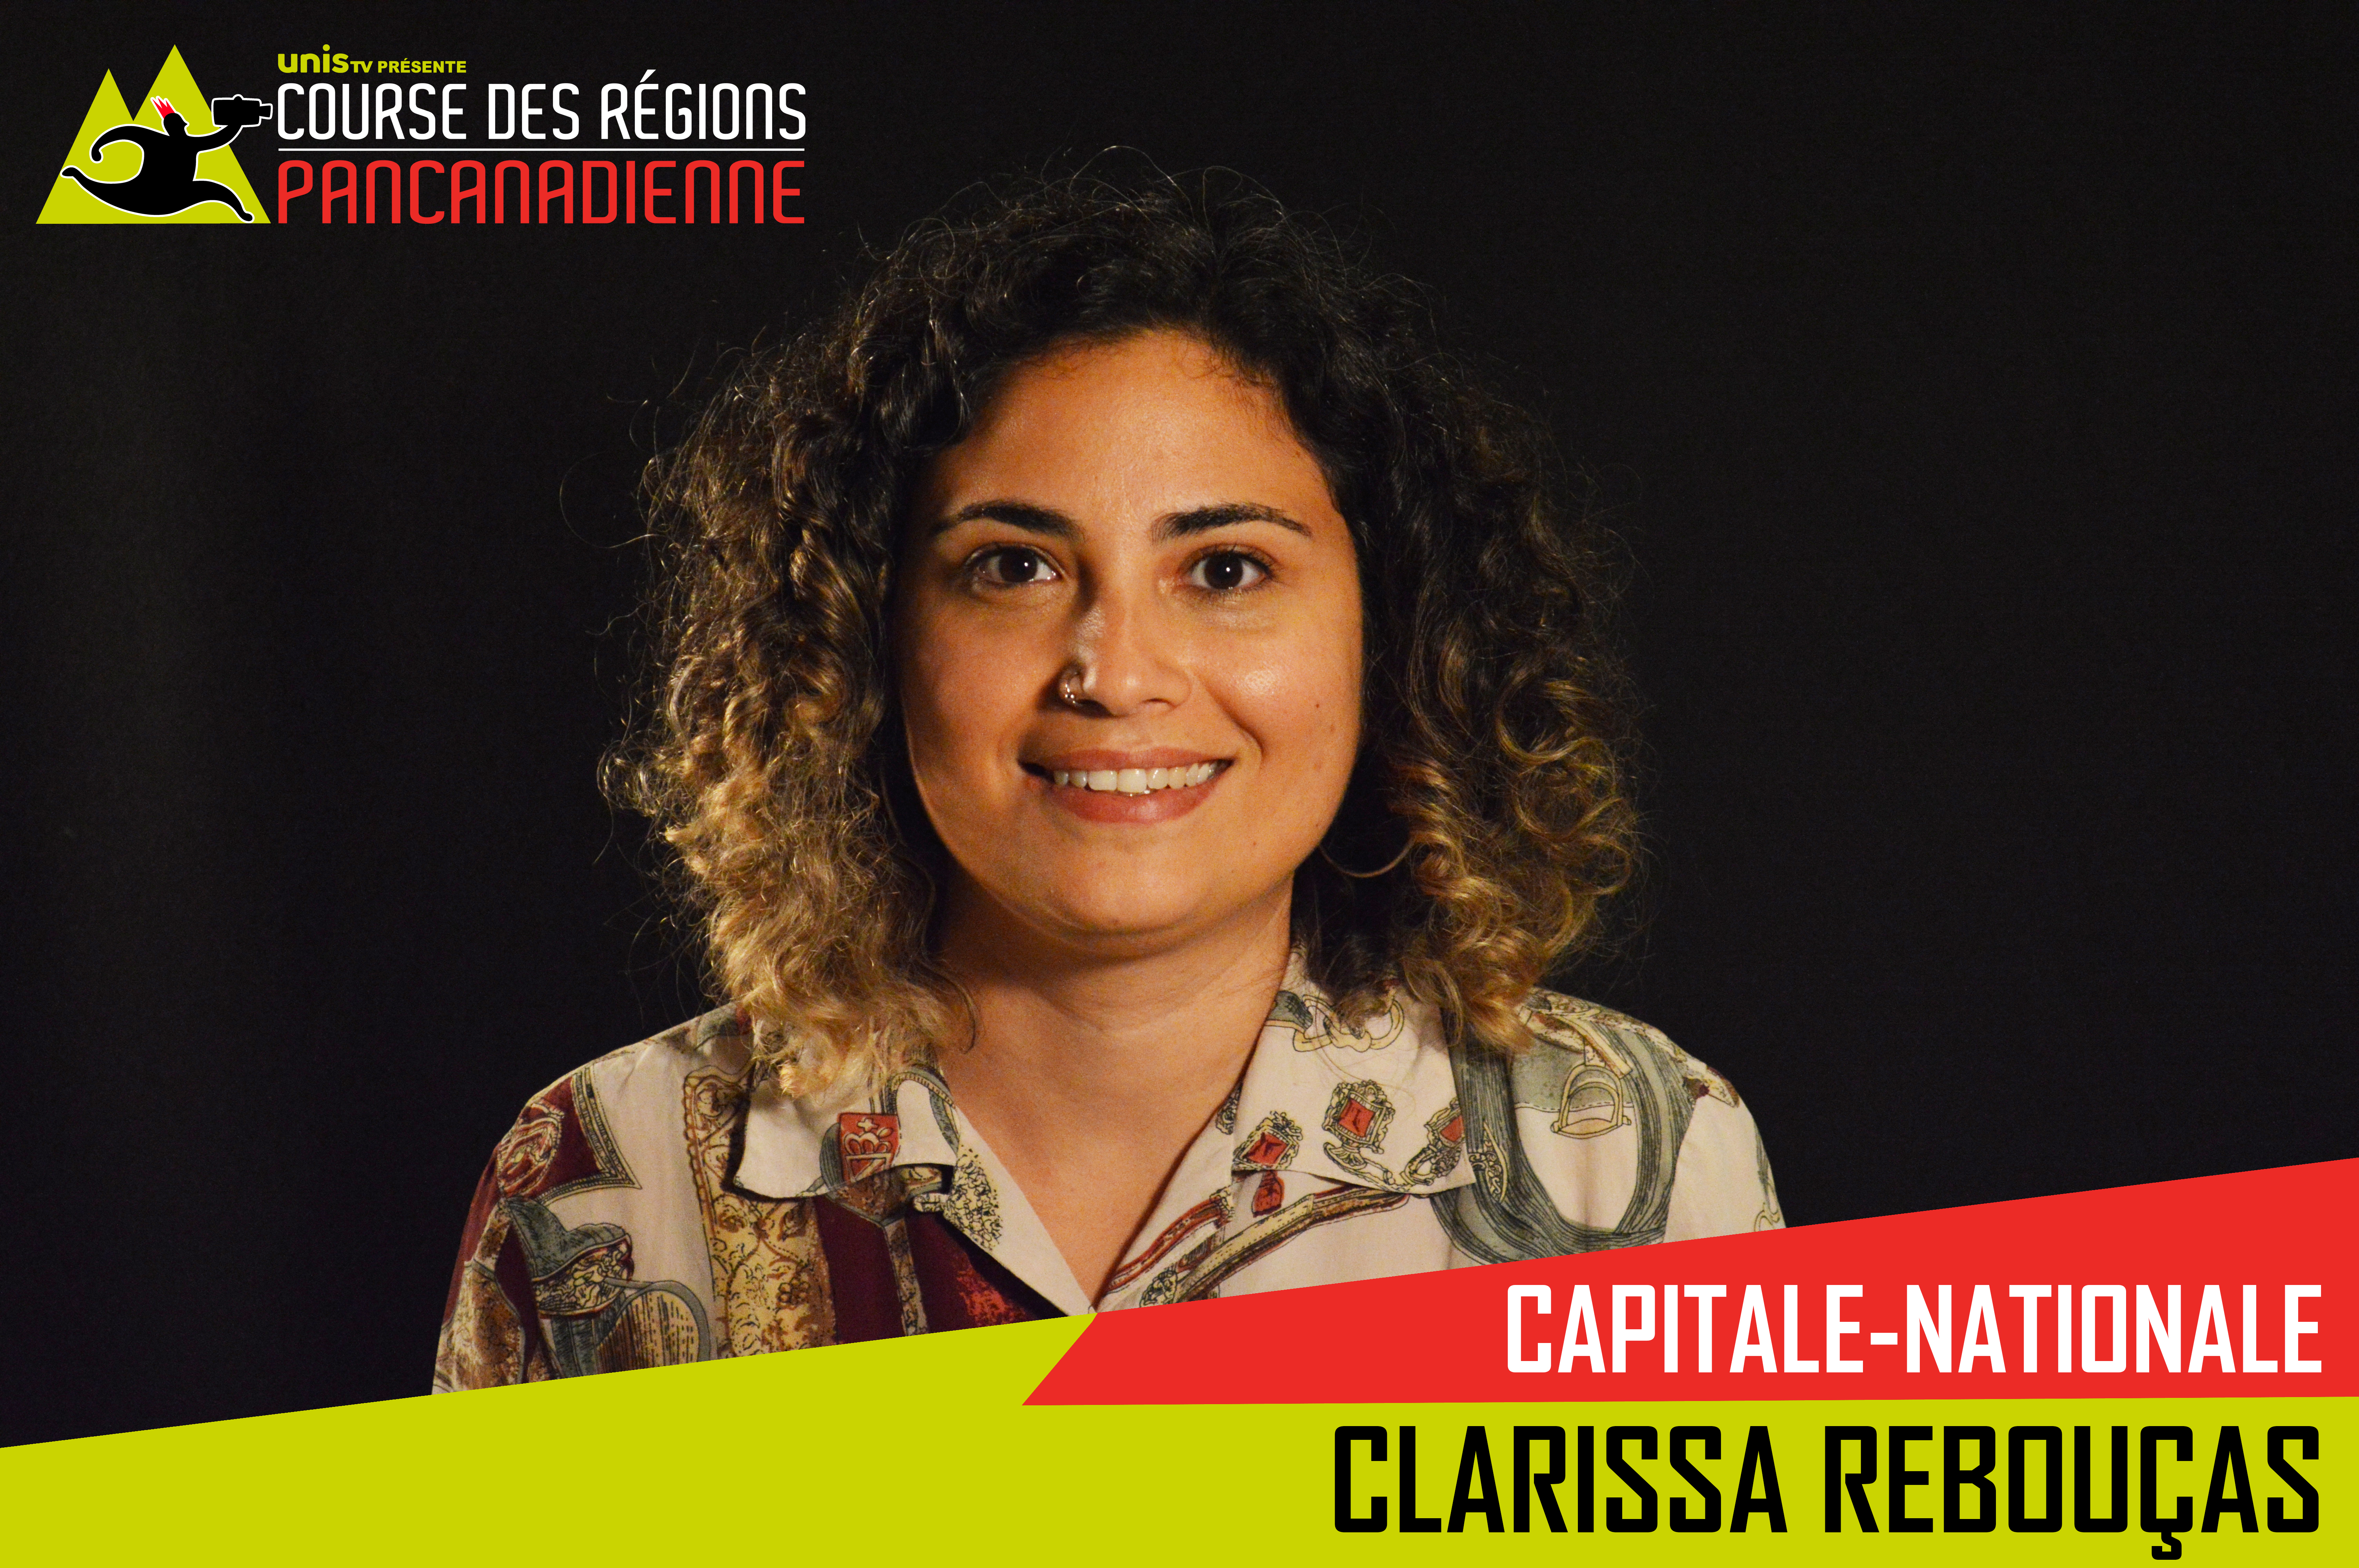 1. Clarissa Reboucas